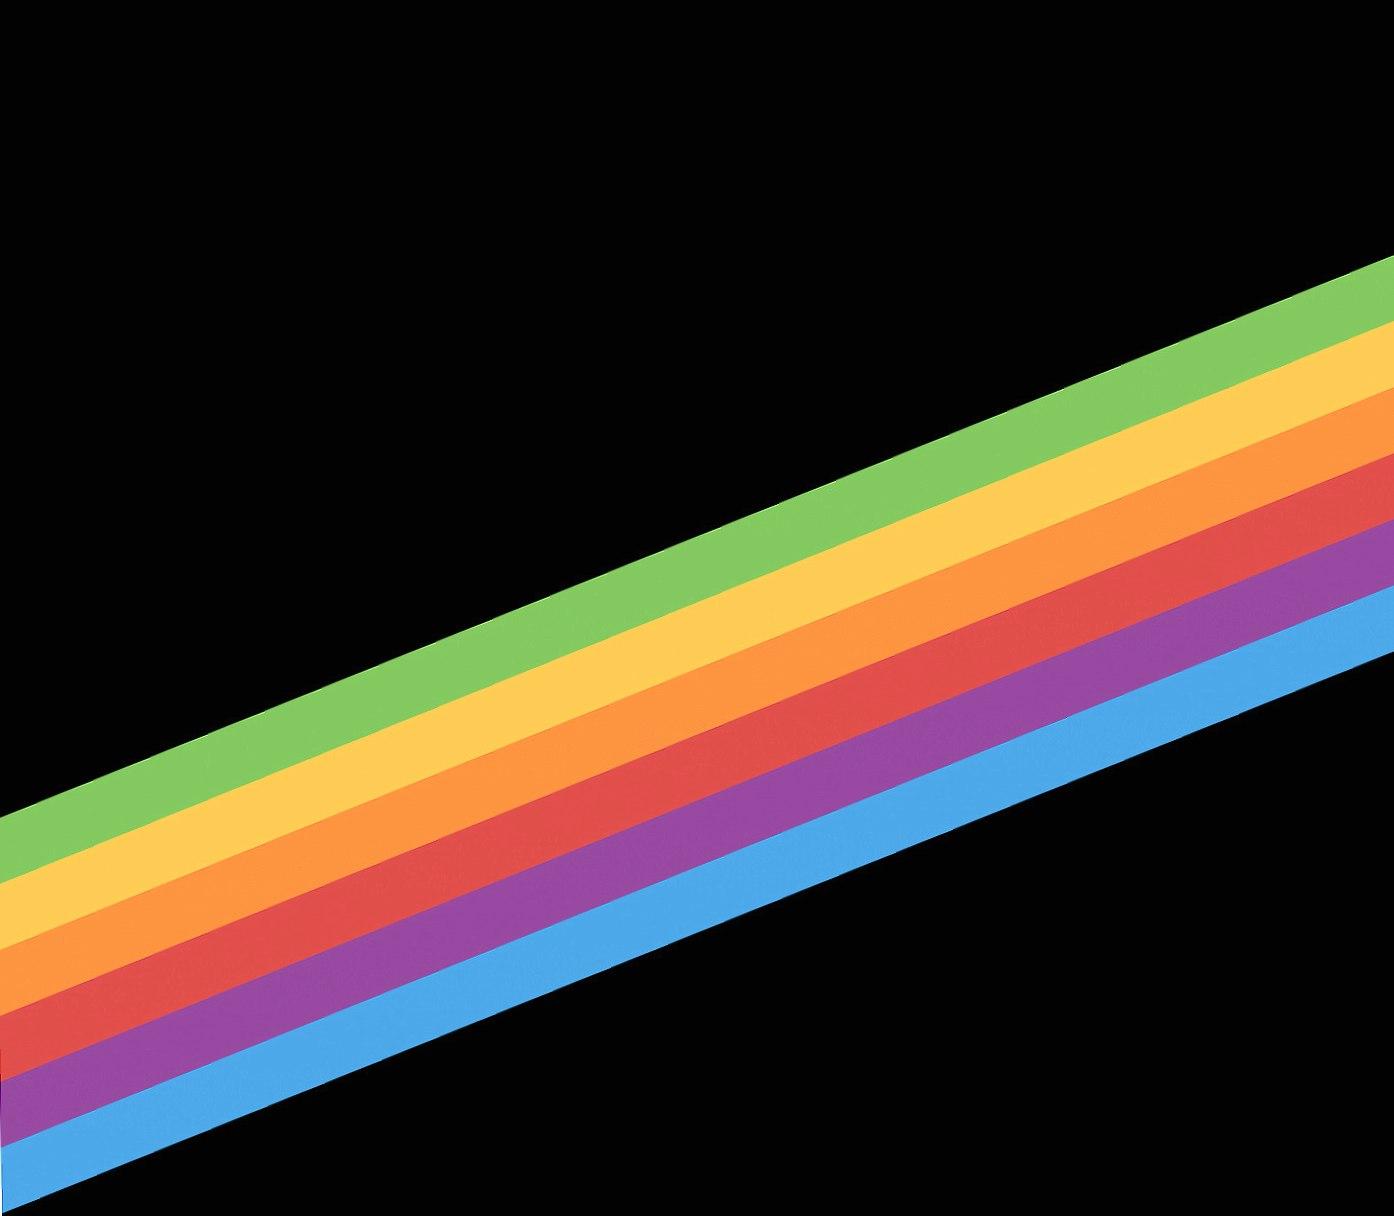 rainbow minimal wallpapers HD quality